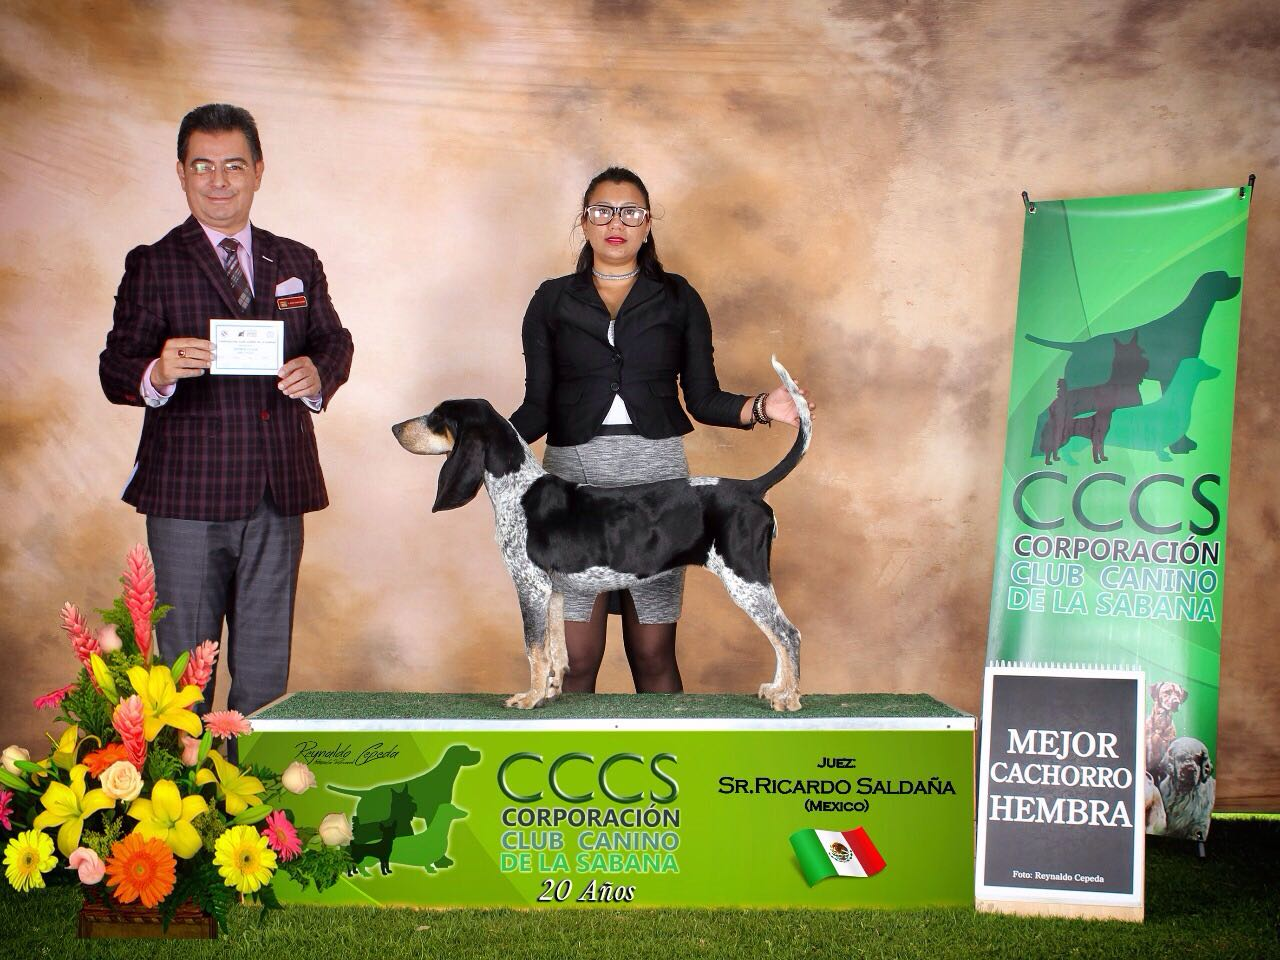 CACHORROS GUANDOLO - CARIBE COLOMBIANO